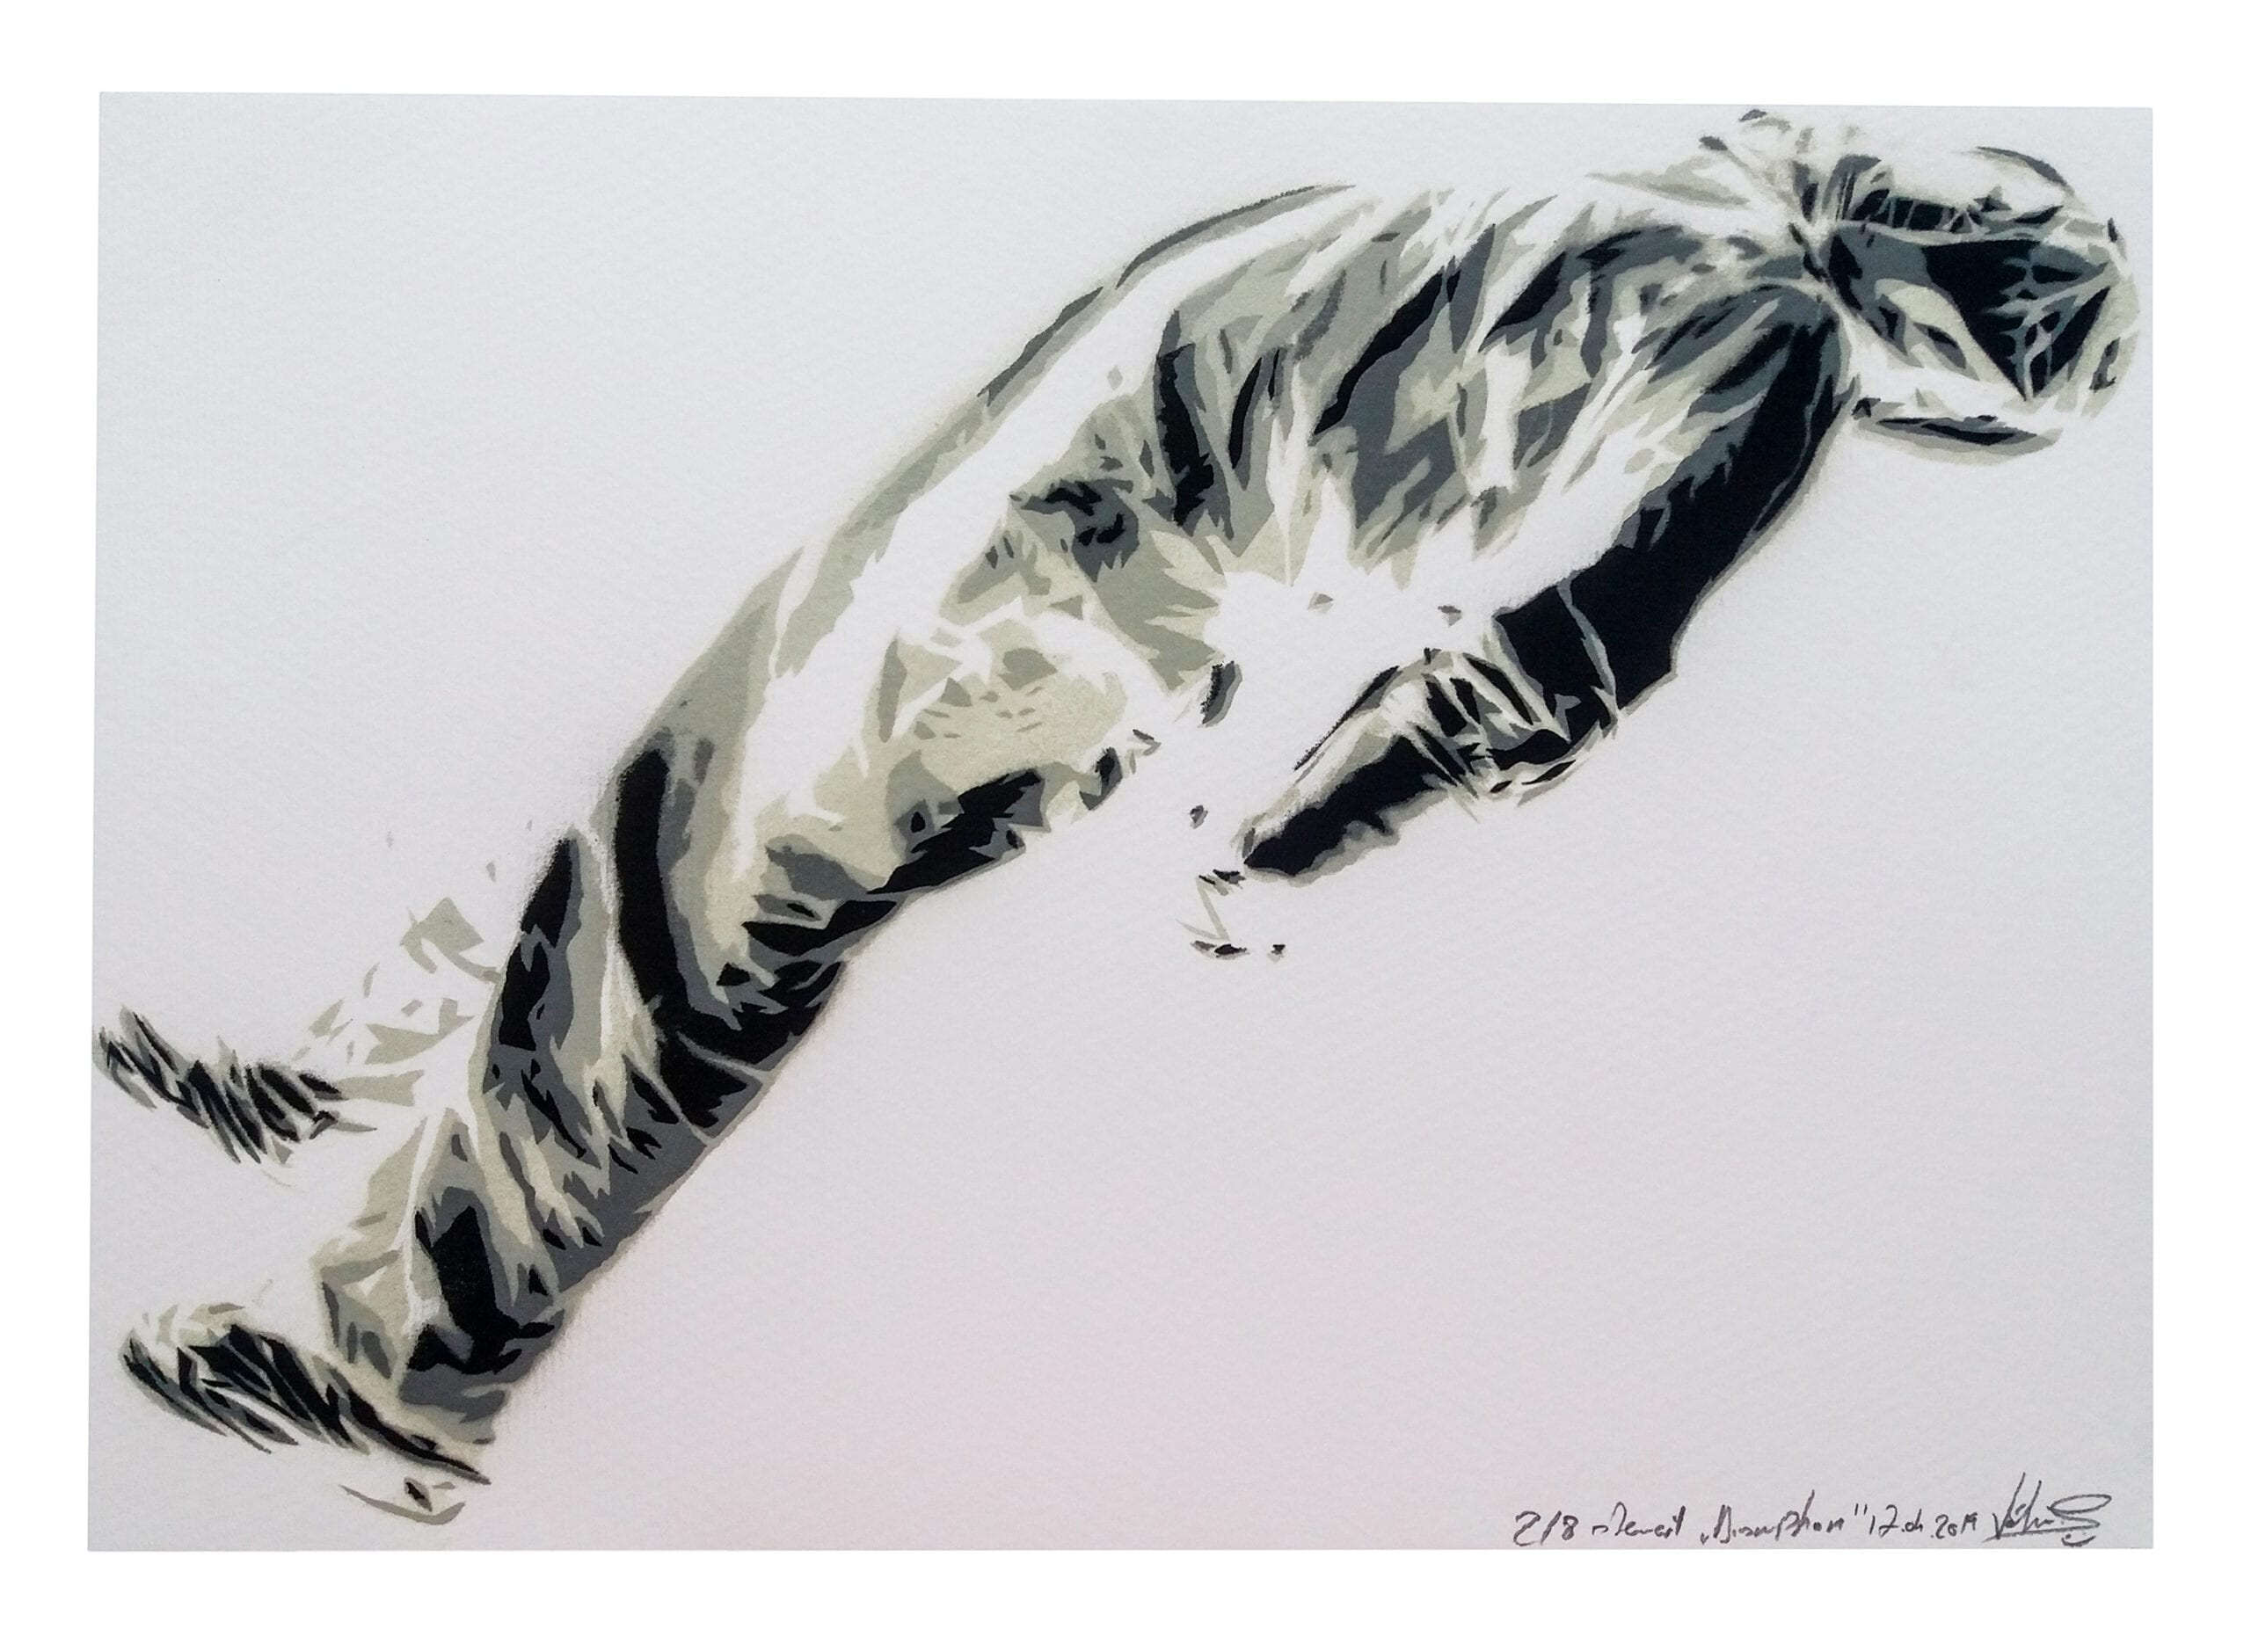 John Dot S disruption-25x36cm-spray on paper